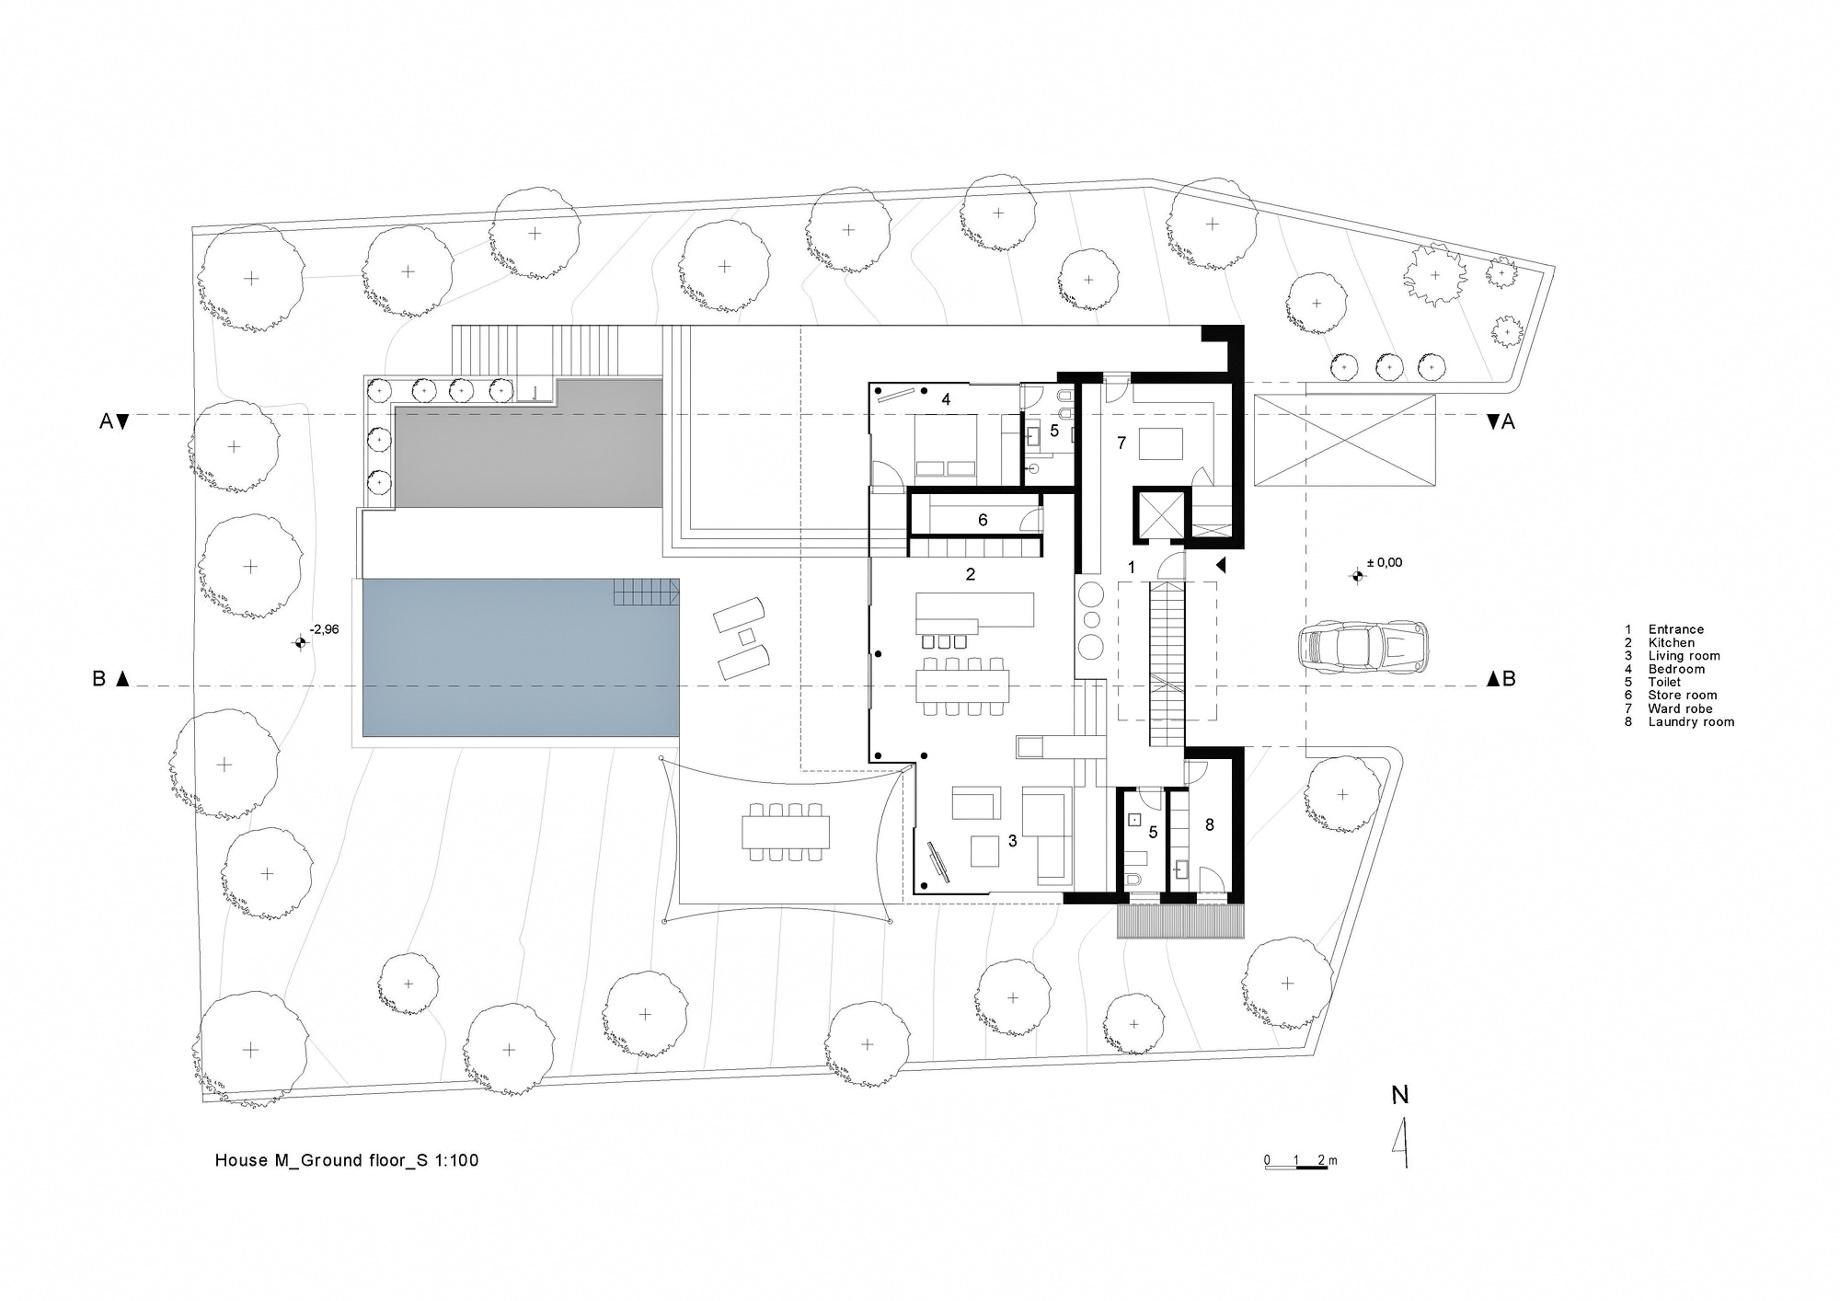 Ground Floor Plan – House M Luxury Residence – Merano, South Tyrol, Italy